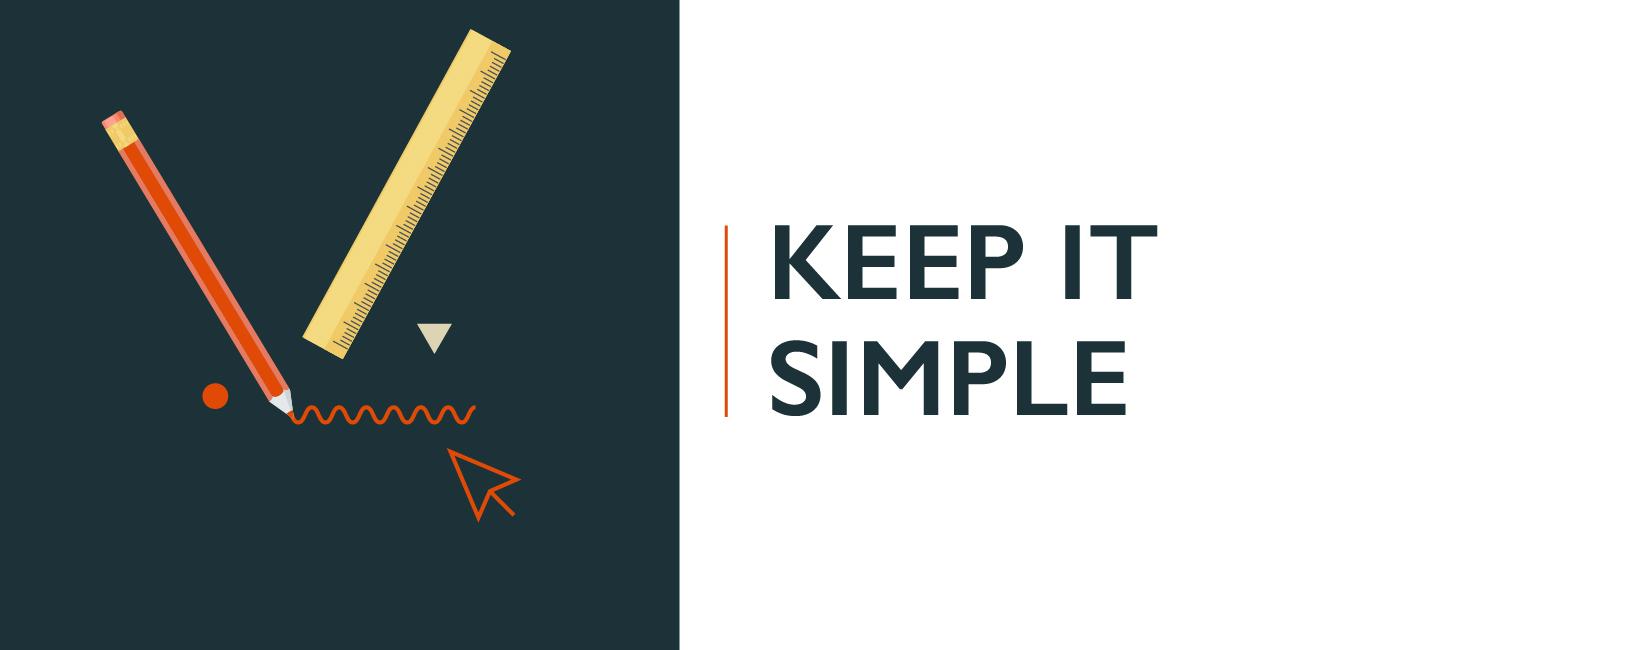 KEEP IT SIMPLE-100.jpg